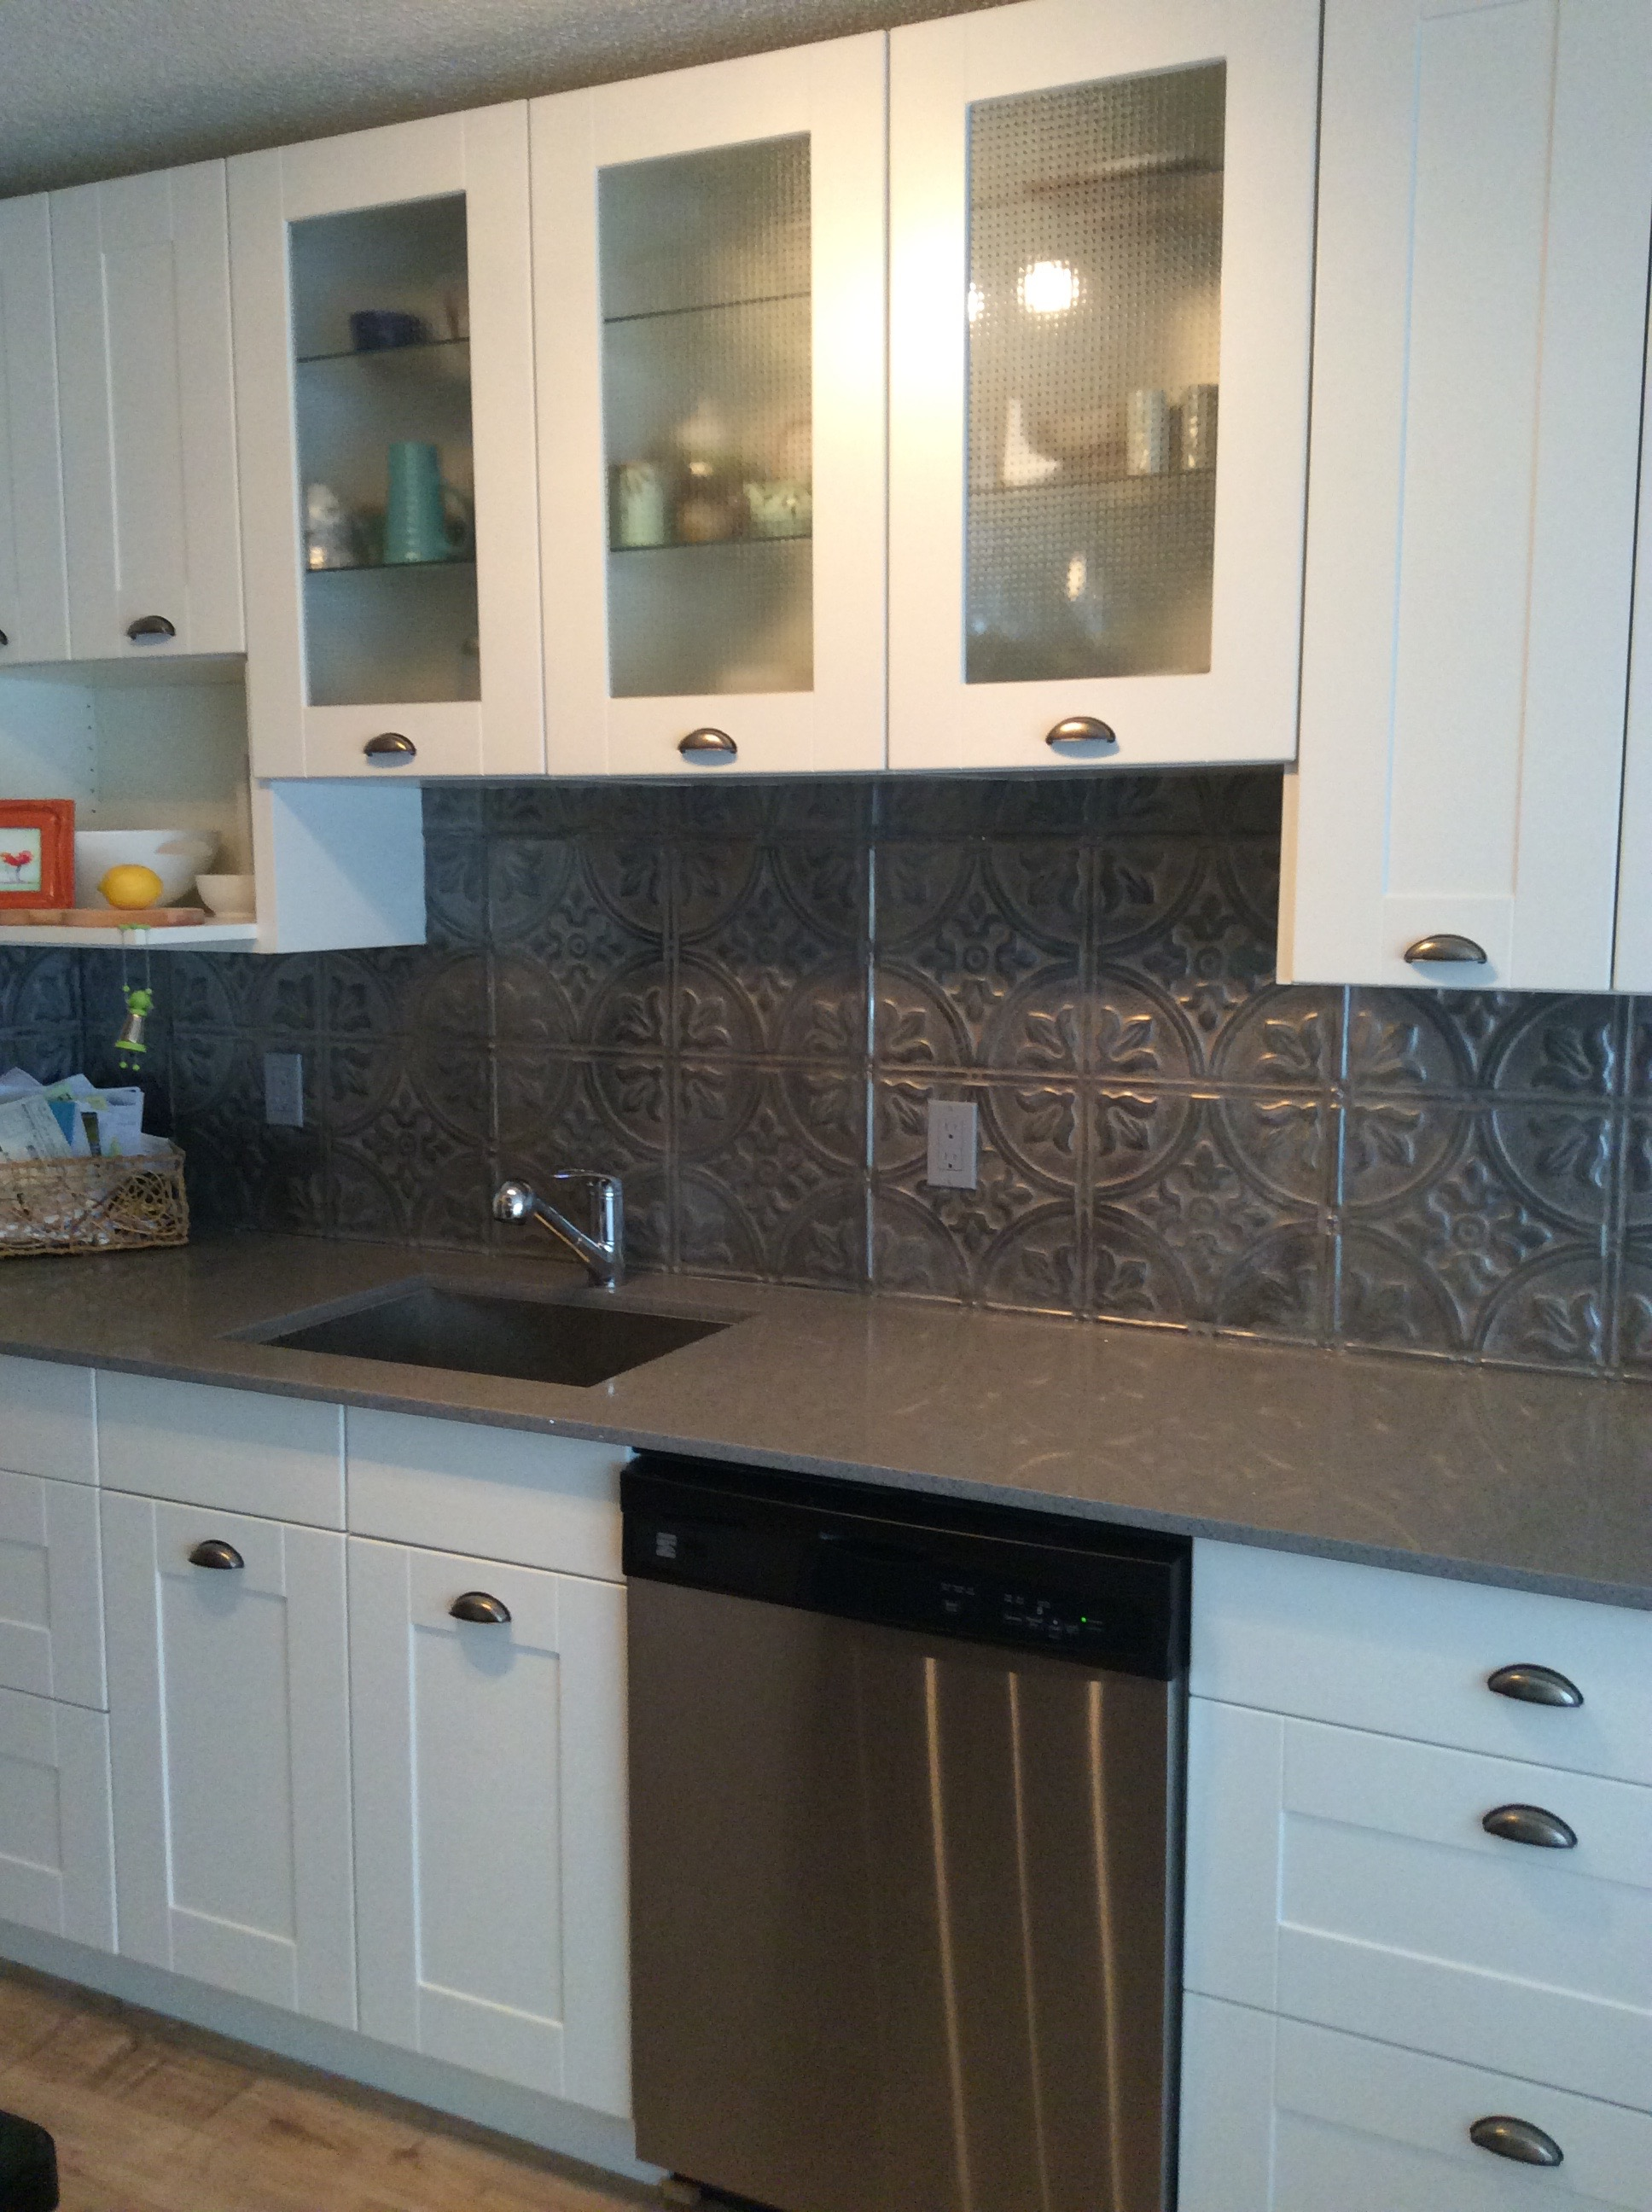 Ikea kitchen, quartz countertops, tin tile backsplash.